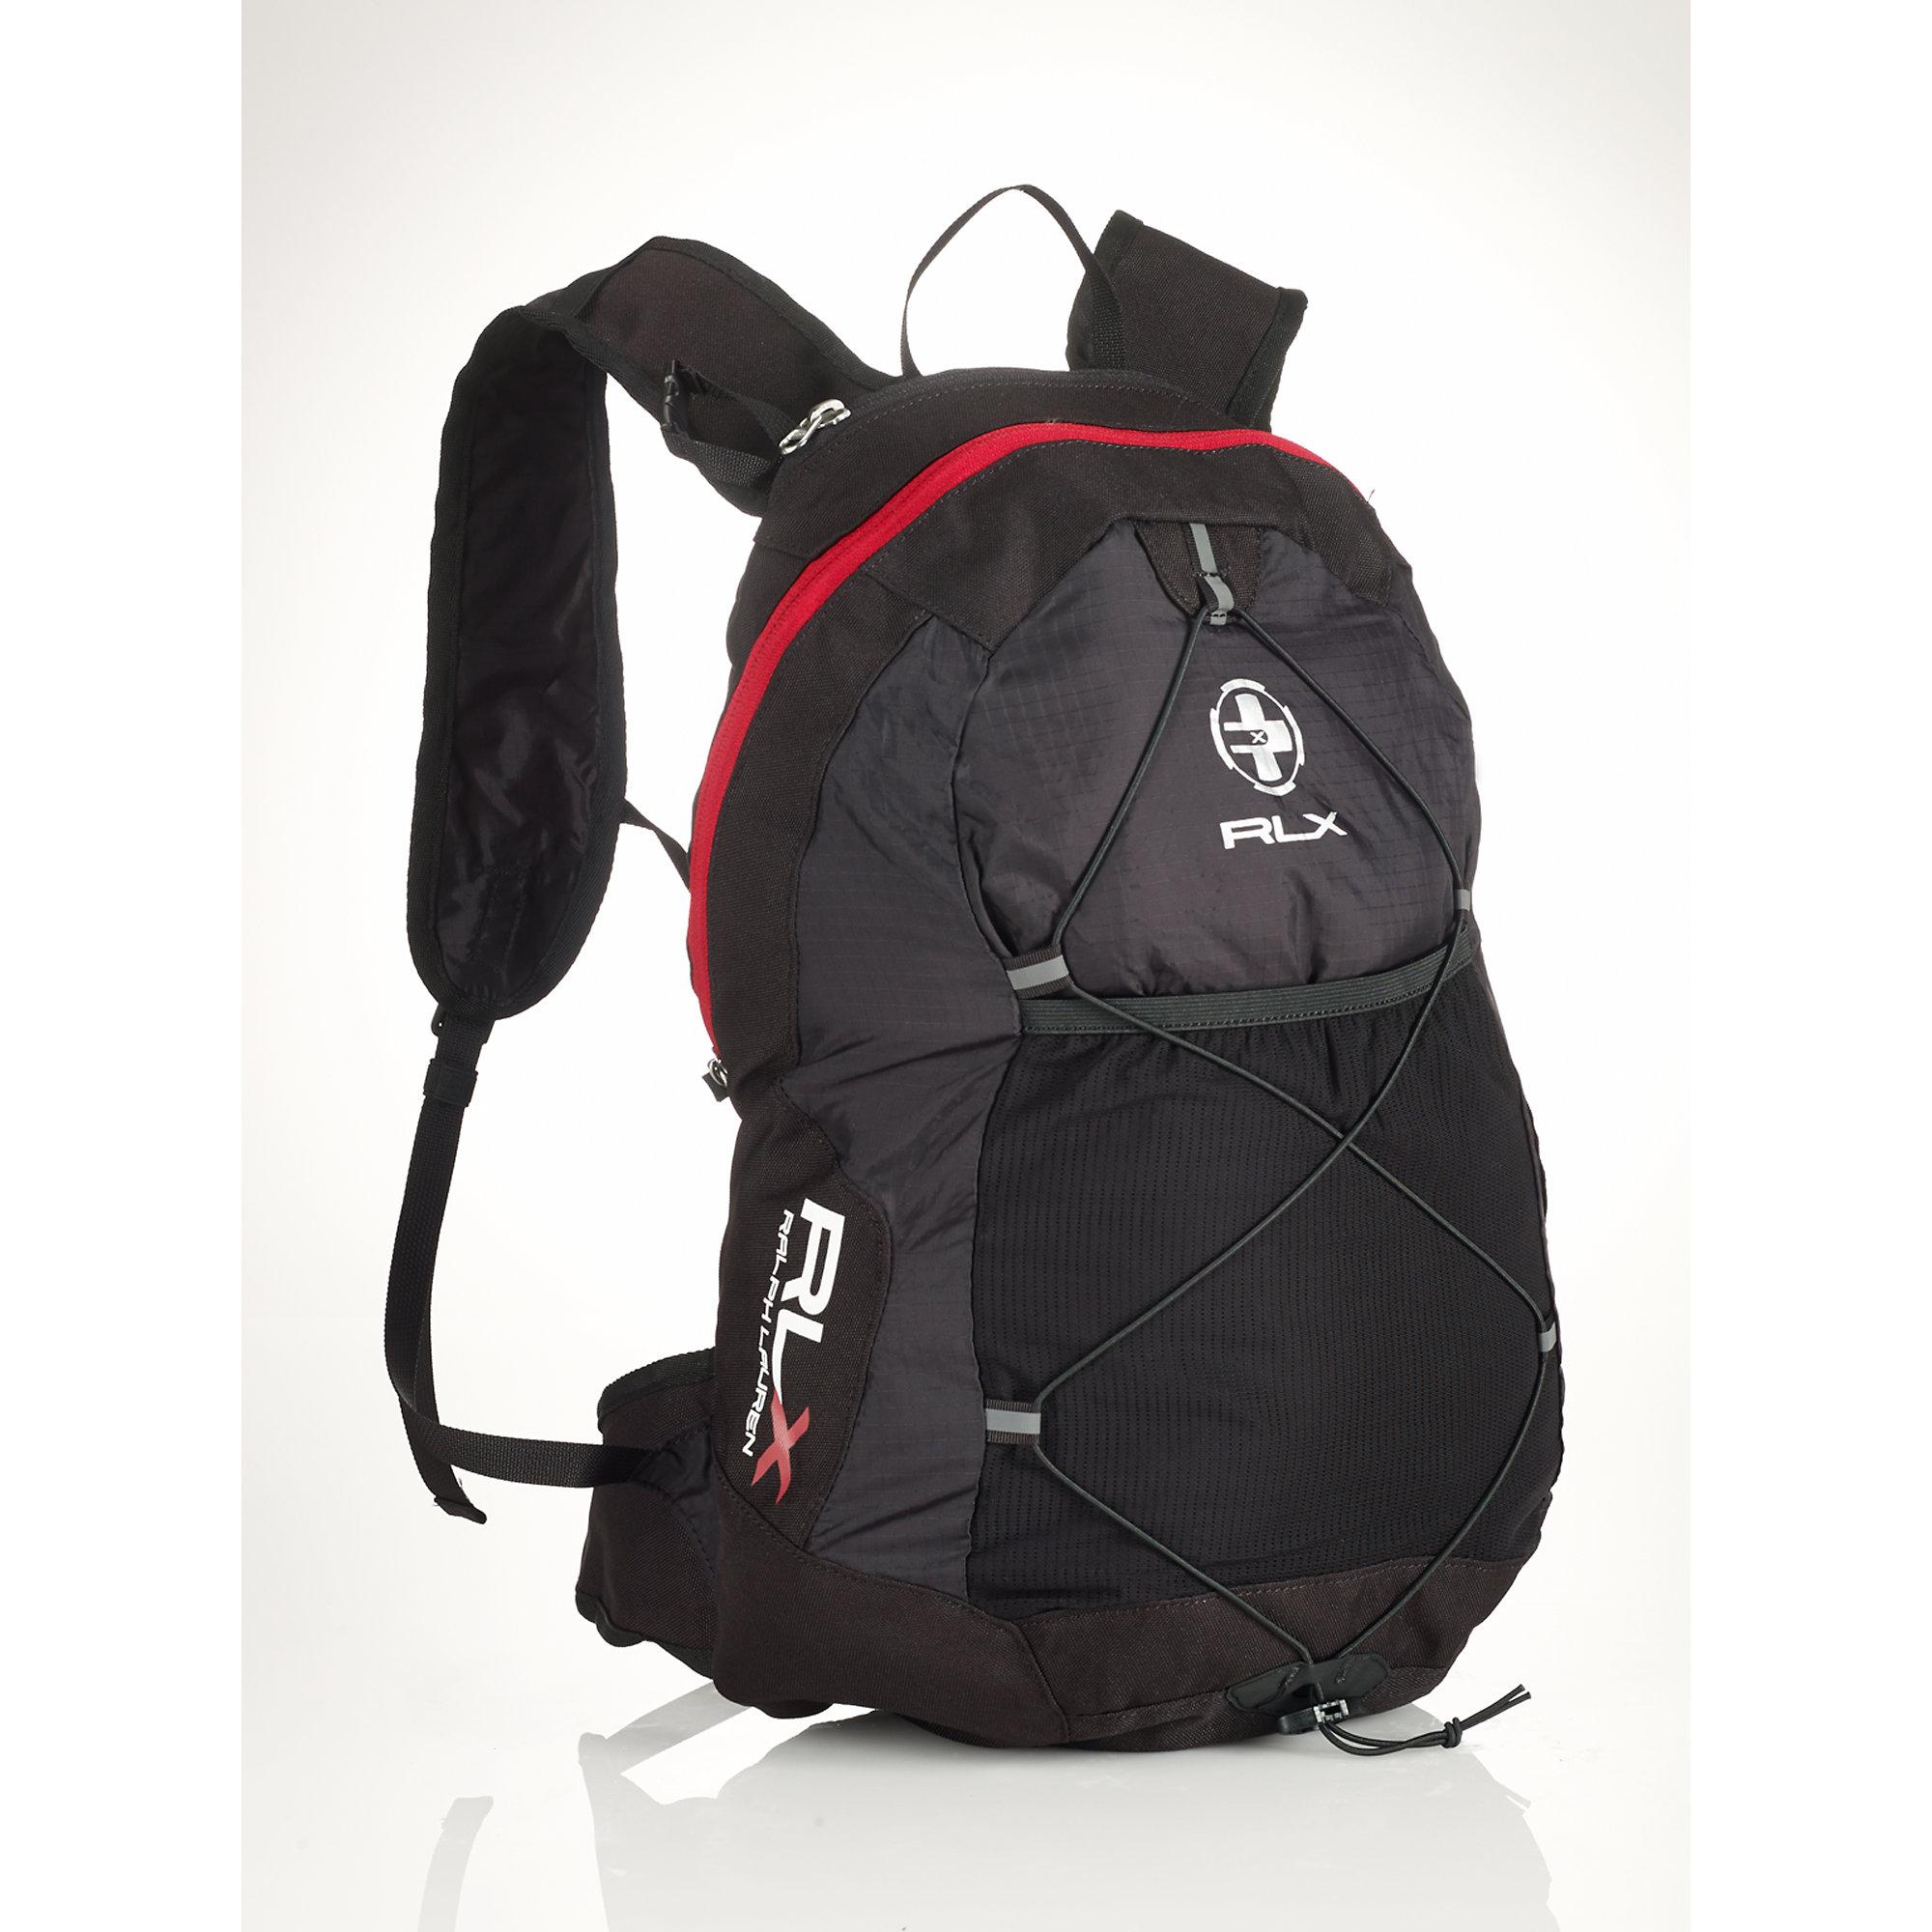 e6c77f27a36 Rlx Polo Sport Backpack   ReGreen Springfield